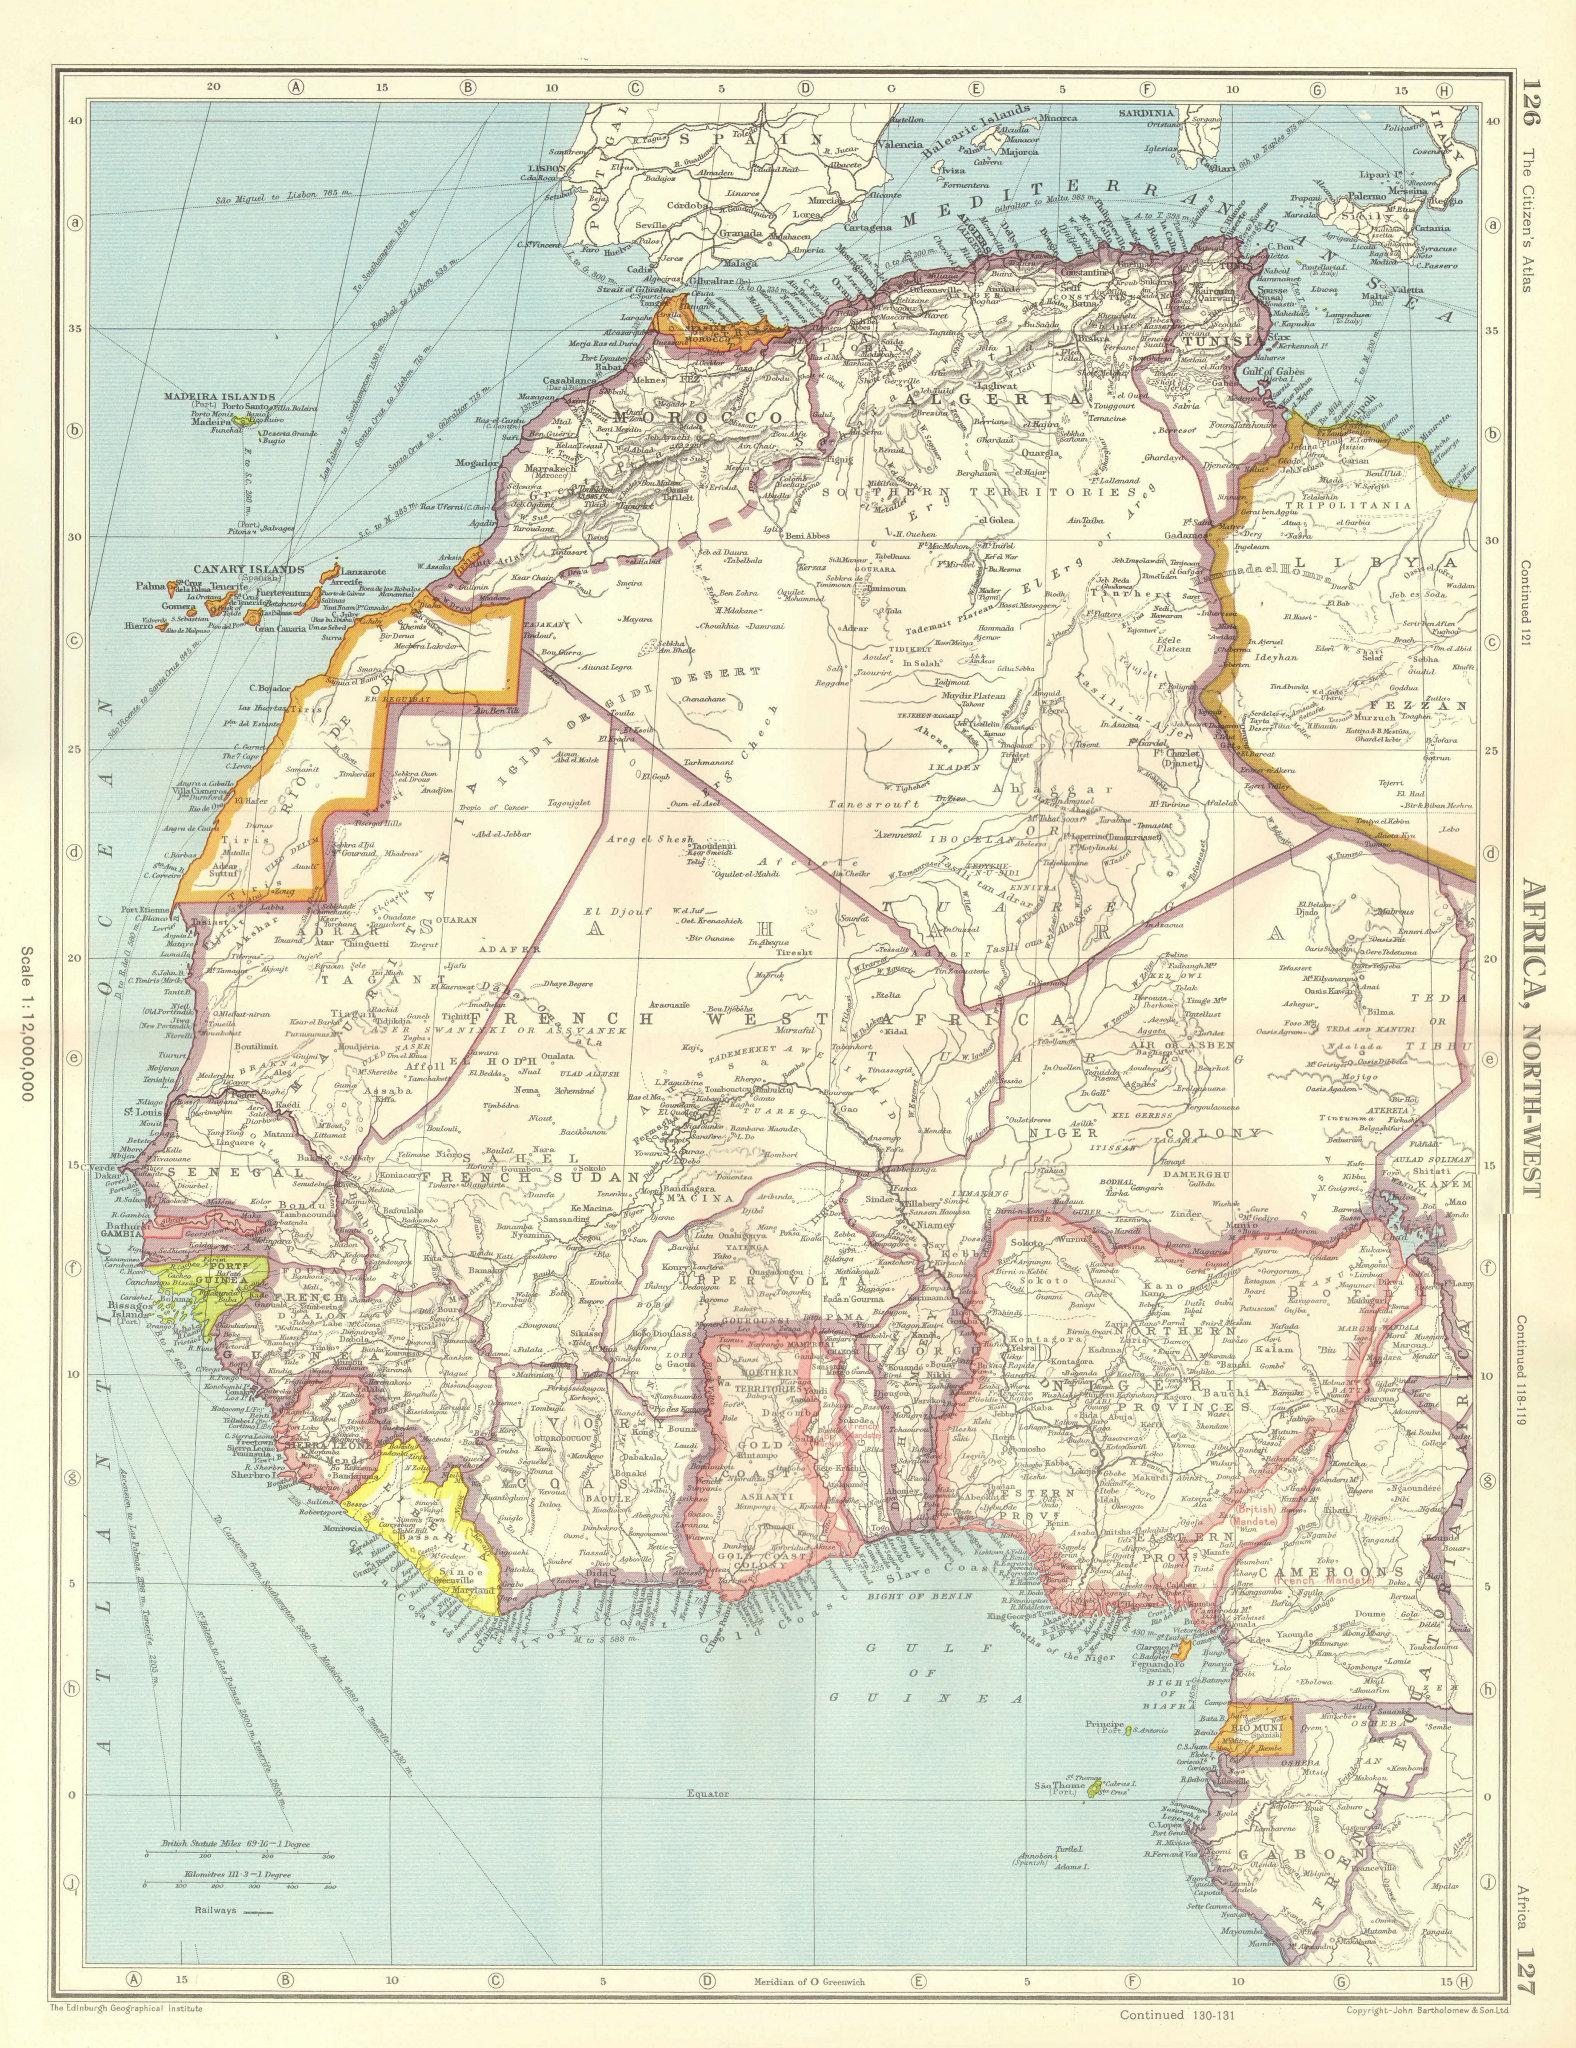 Associate Product AFRICA. French West Africa. Rio de Oro Rio Muni Nigeria. BARTHOLOMEW 1952 map